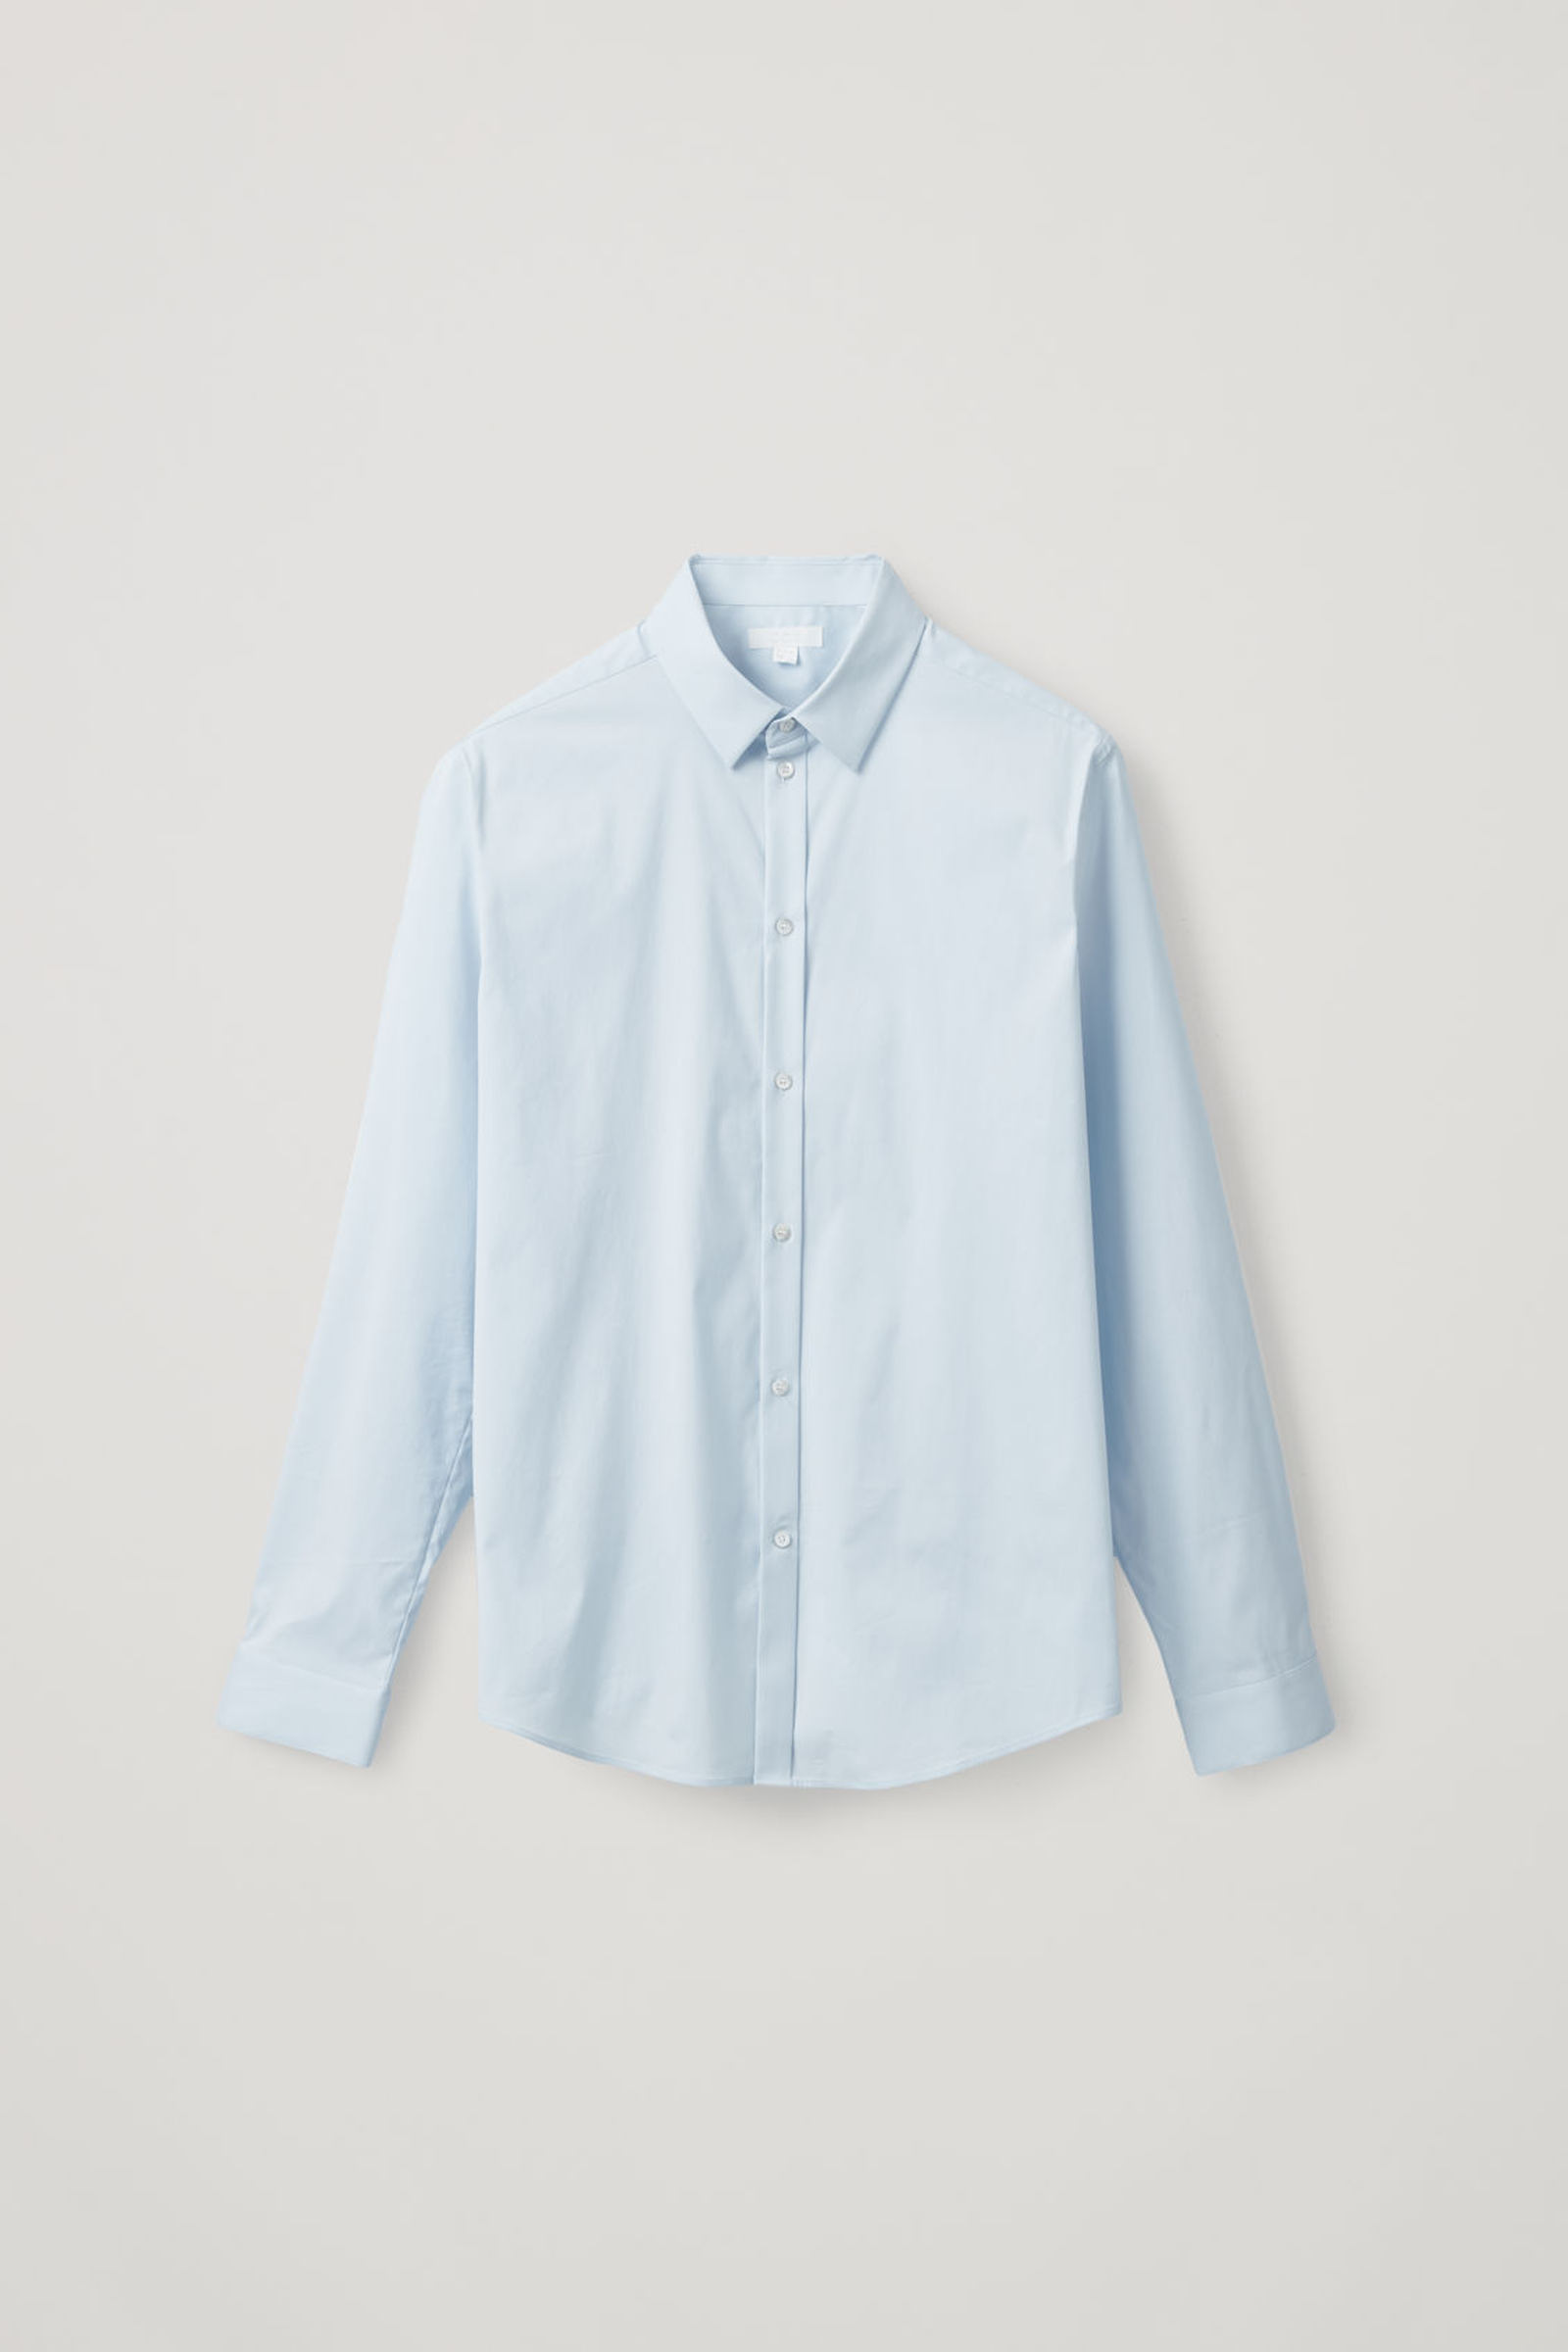 COS 오가닉 코튼 클래식 슬림 핏 셔츠의 스카이 블루컬러 Product입니다.